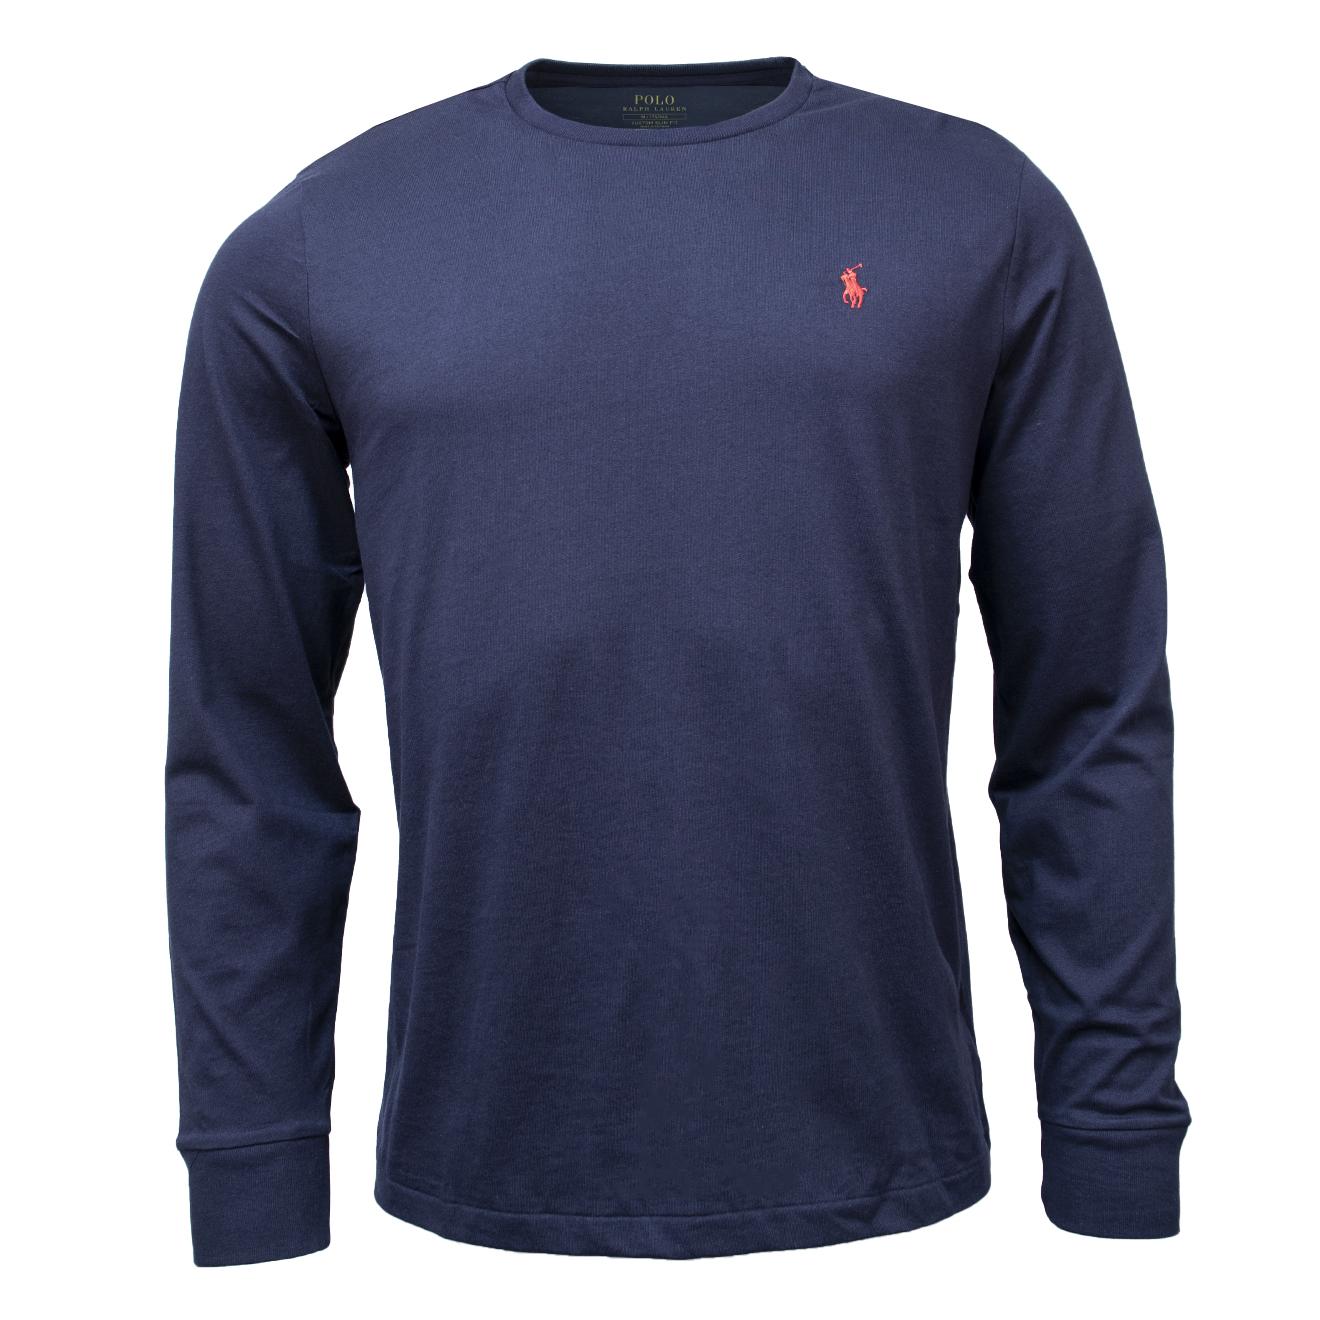 b7fd03be Polo Ralph Lauren Custom Slim Fit Cotton LS T-Shirt Polo Ink Navy ...